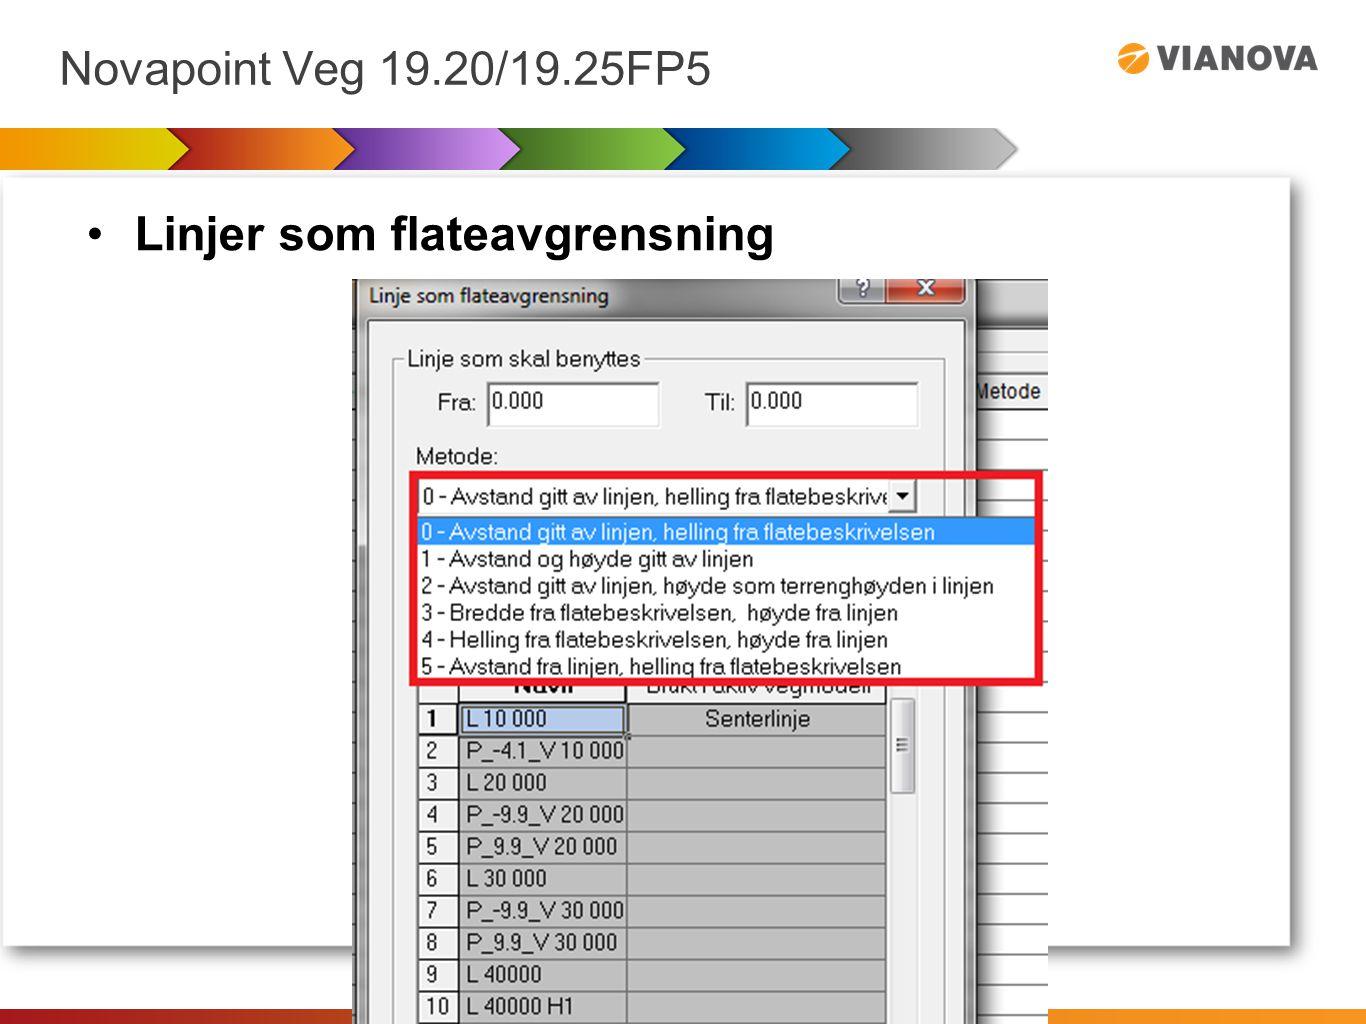 Novapoint Veg 19.20/19.25FP5 Linjer som flateavgrensning